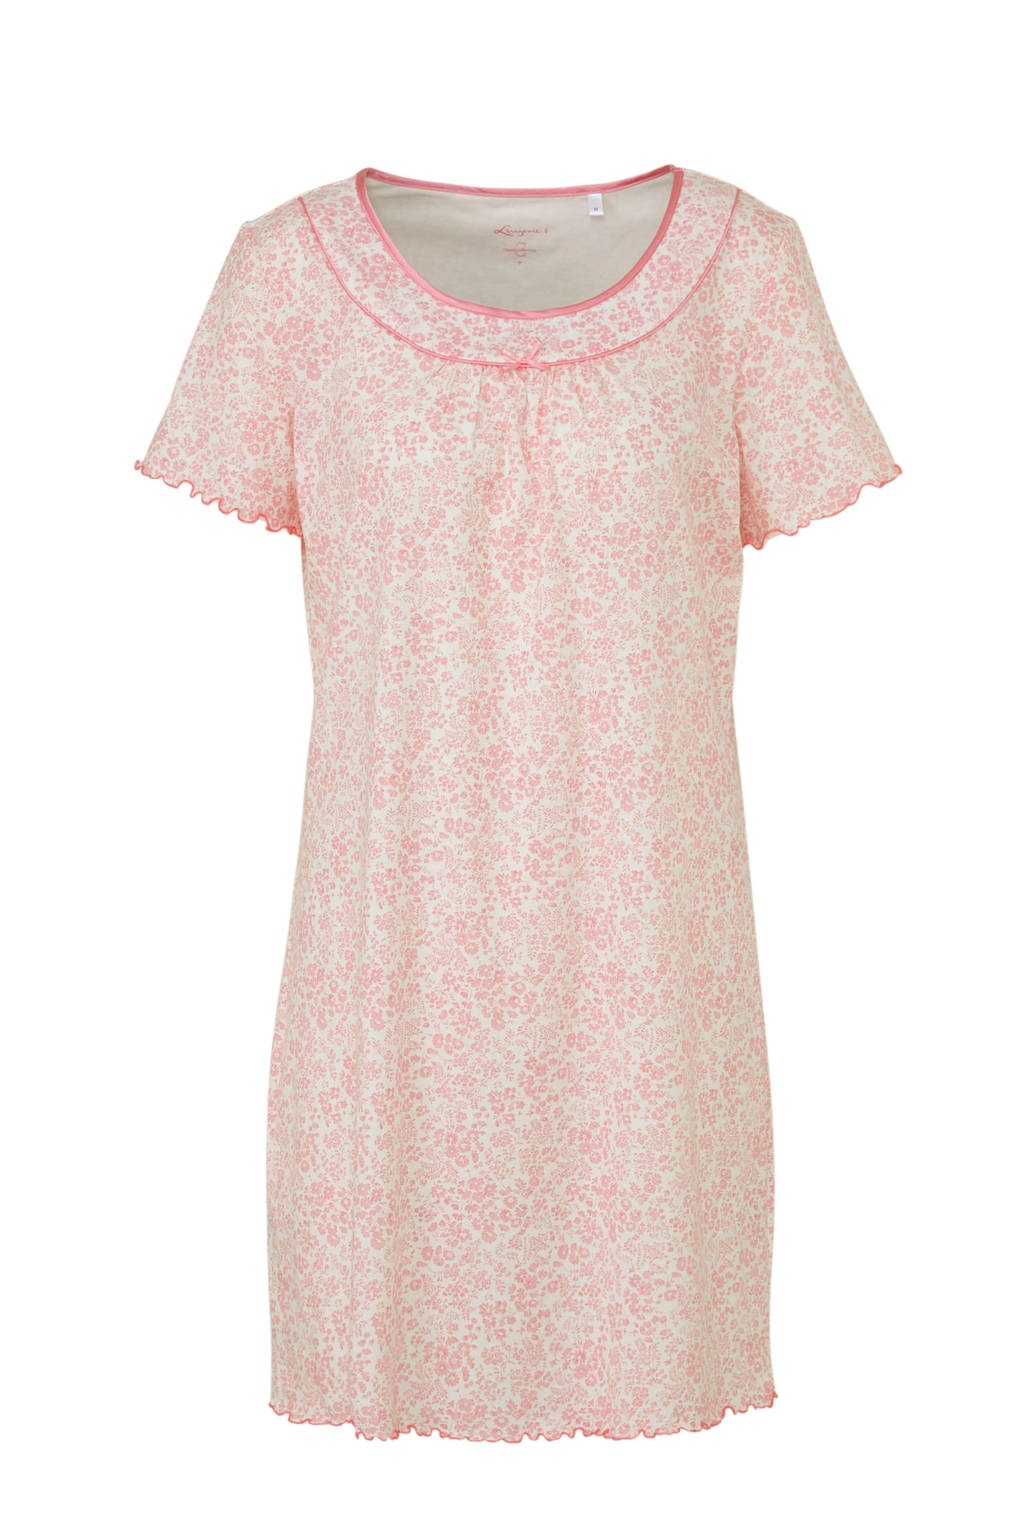 C&A nachthemd met all over print roze, Roze/ecru